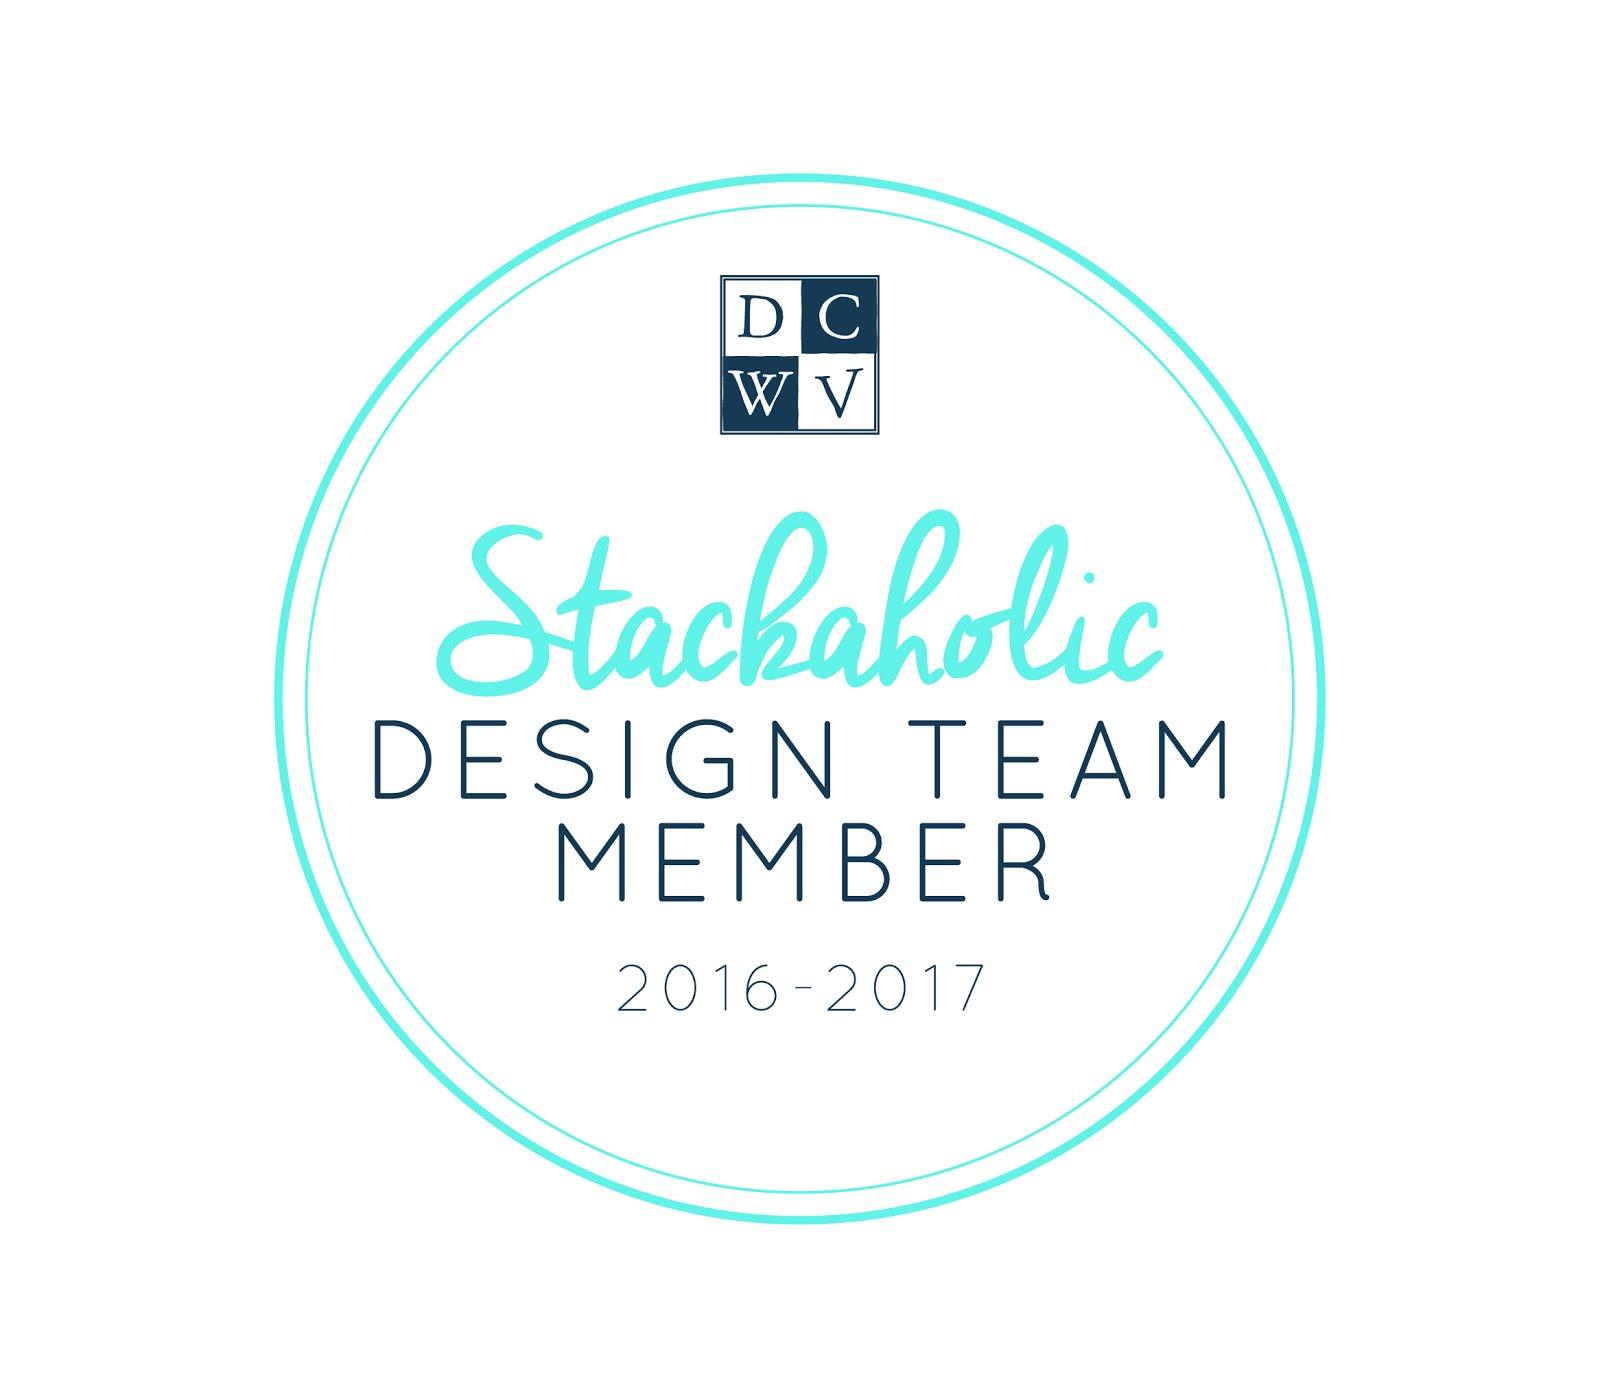 DCWV Design Team Member 2016-2017